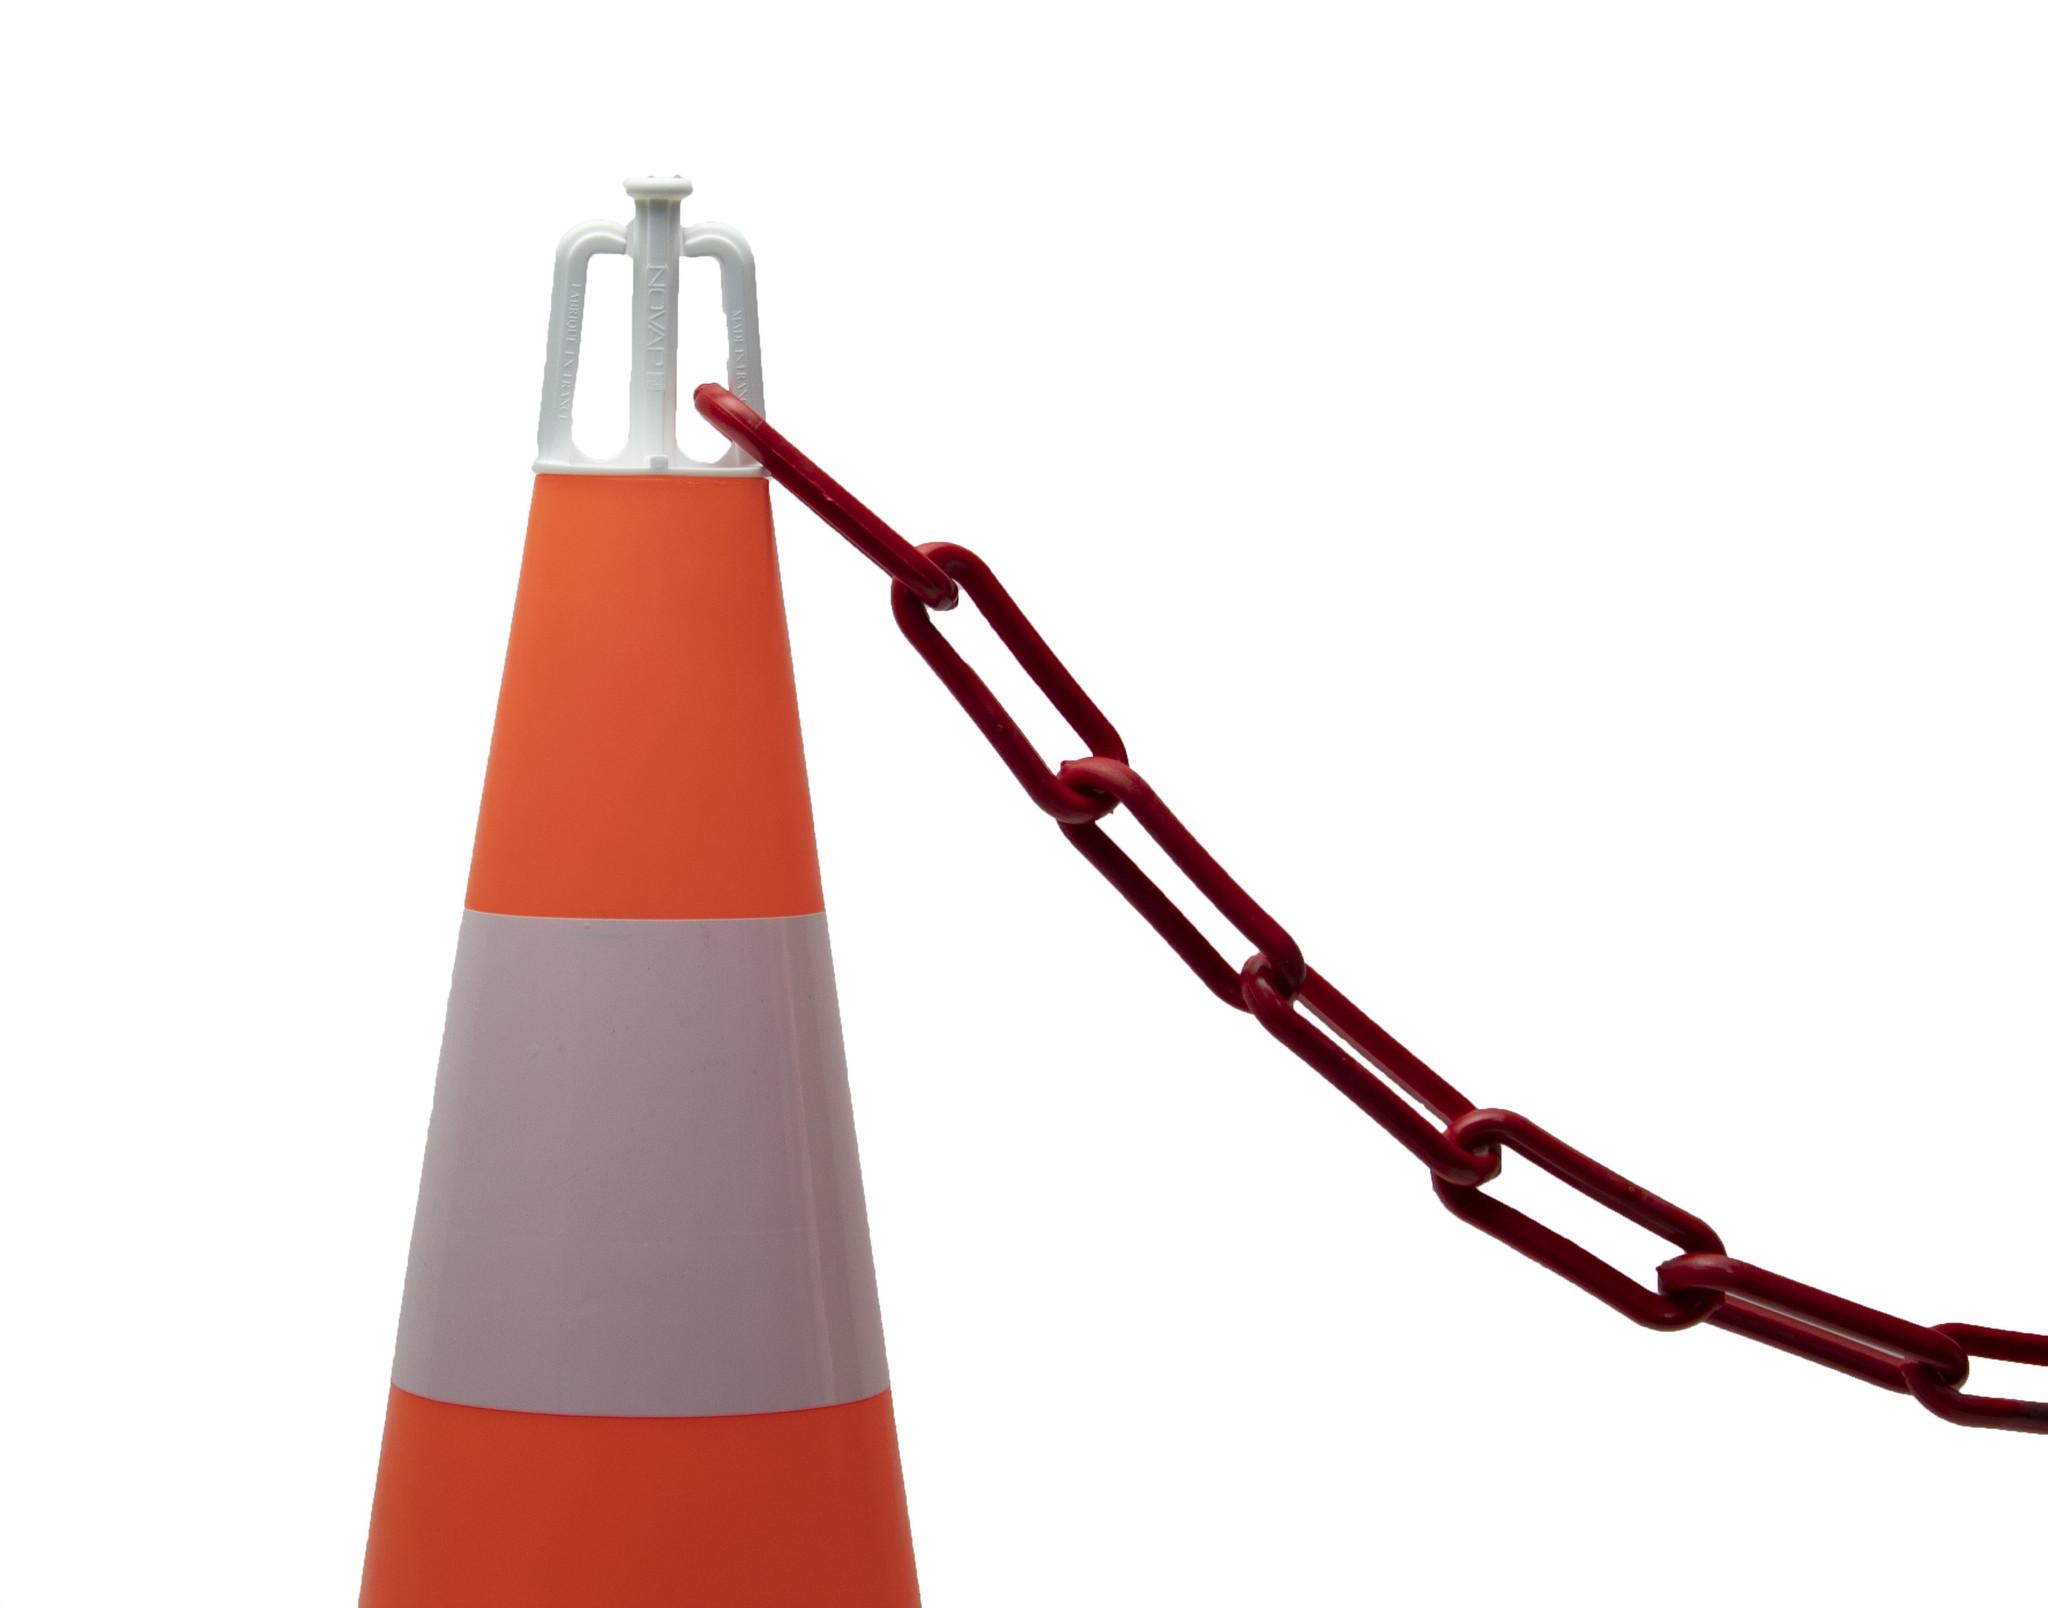 Set 5 Traffic cones (50 cm) and 7.5 m plastic chain (Ø 8mm)